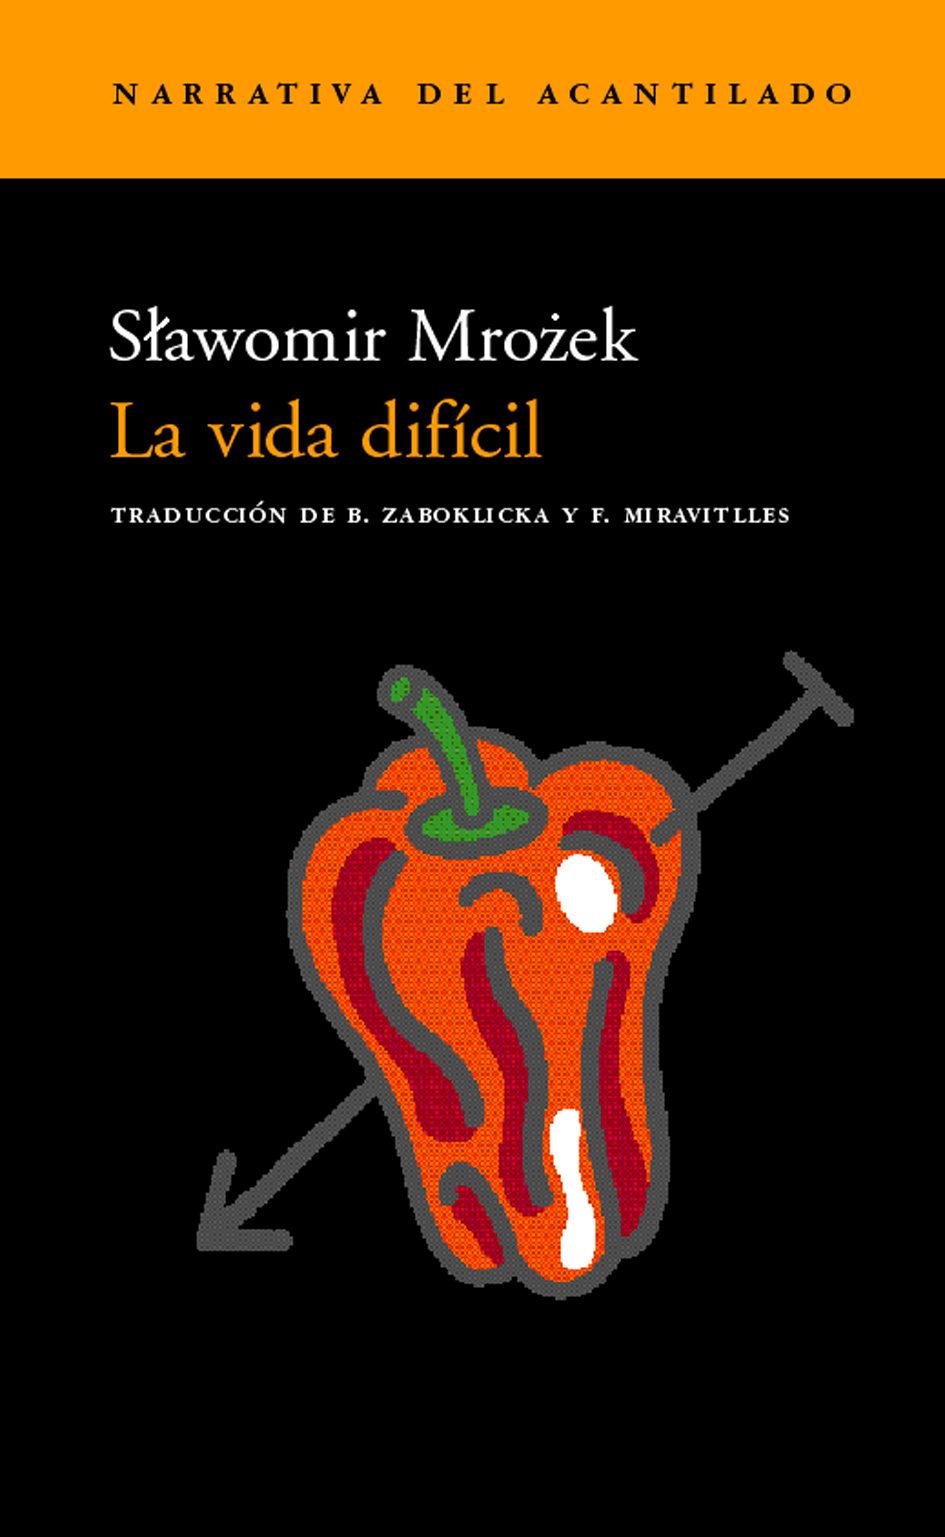 La Vida Dificil por Slawomir Mrozek